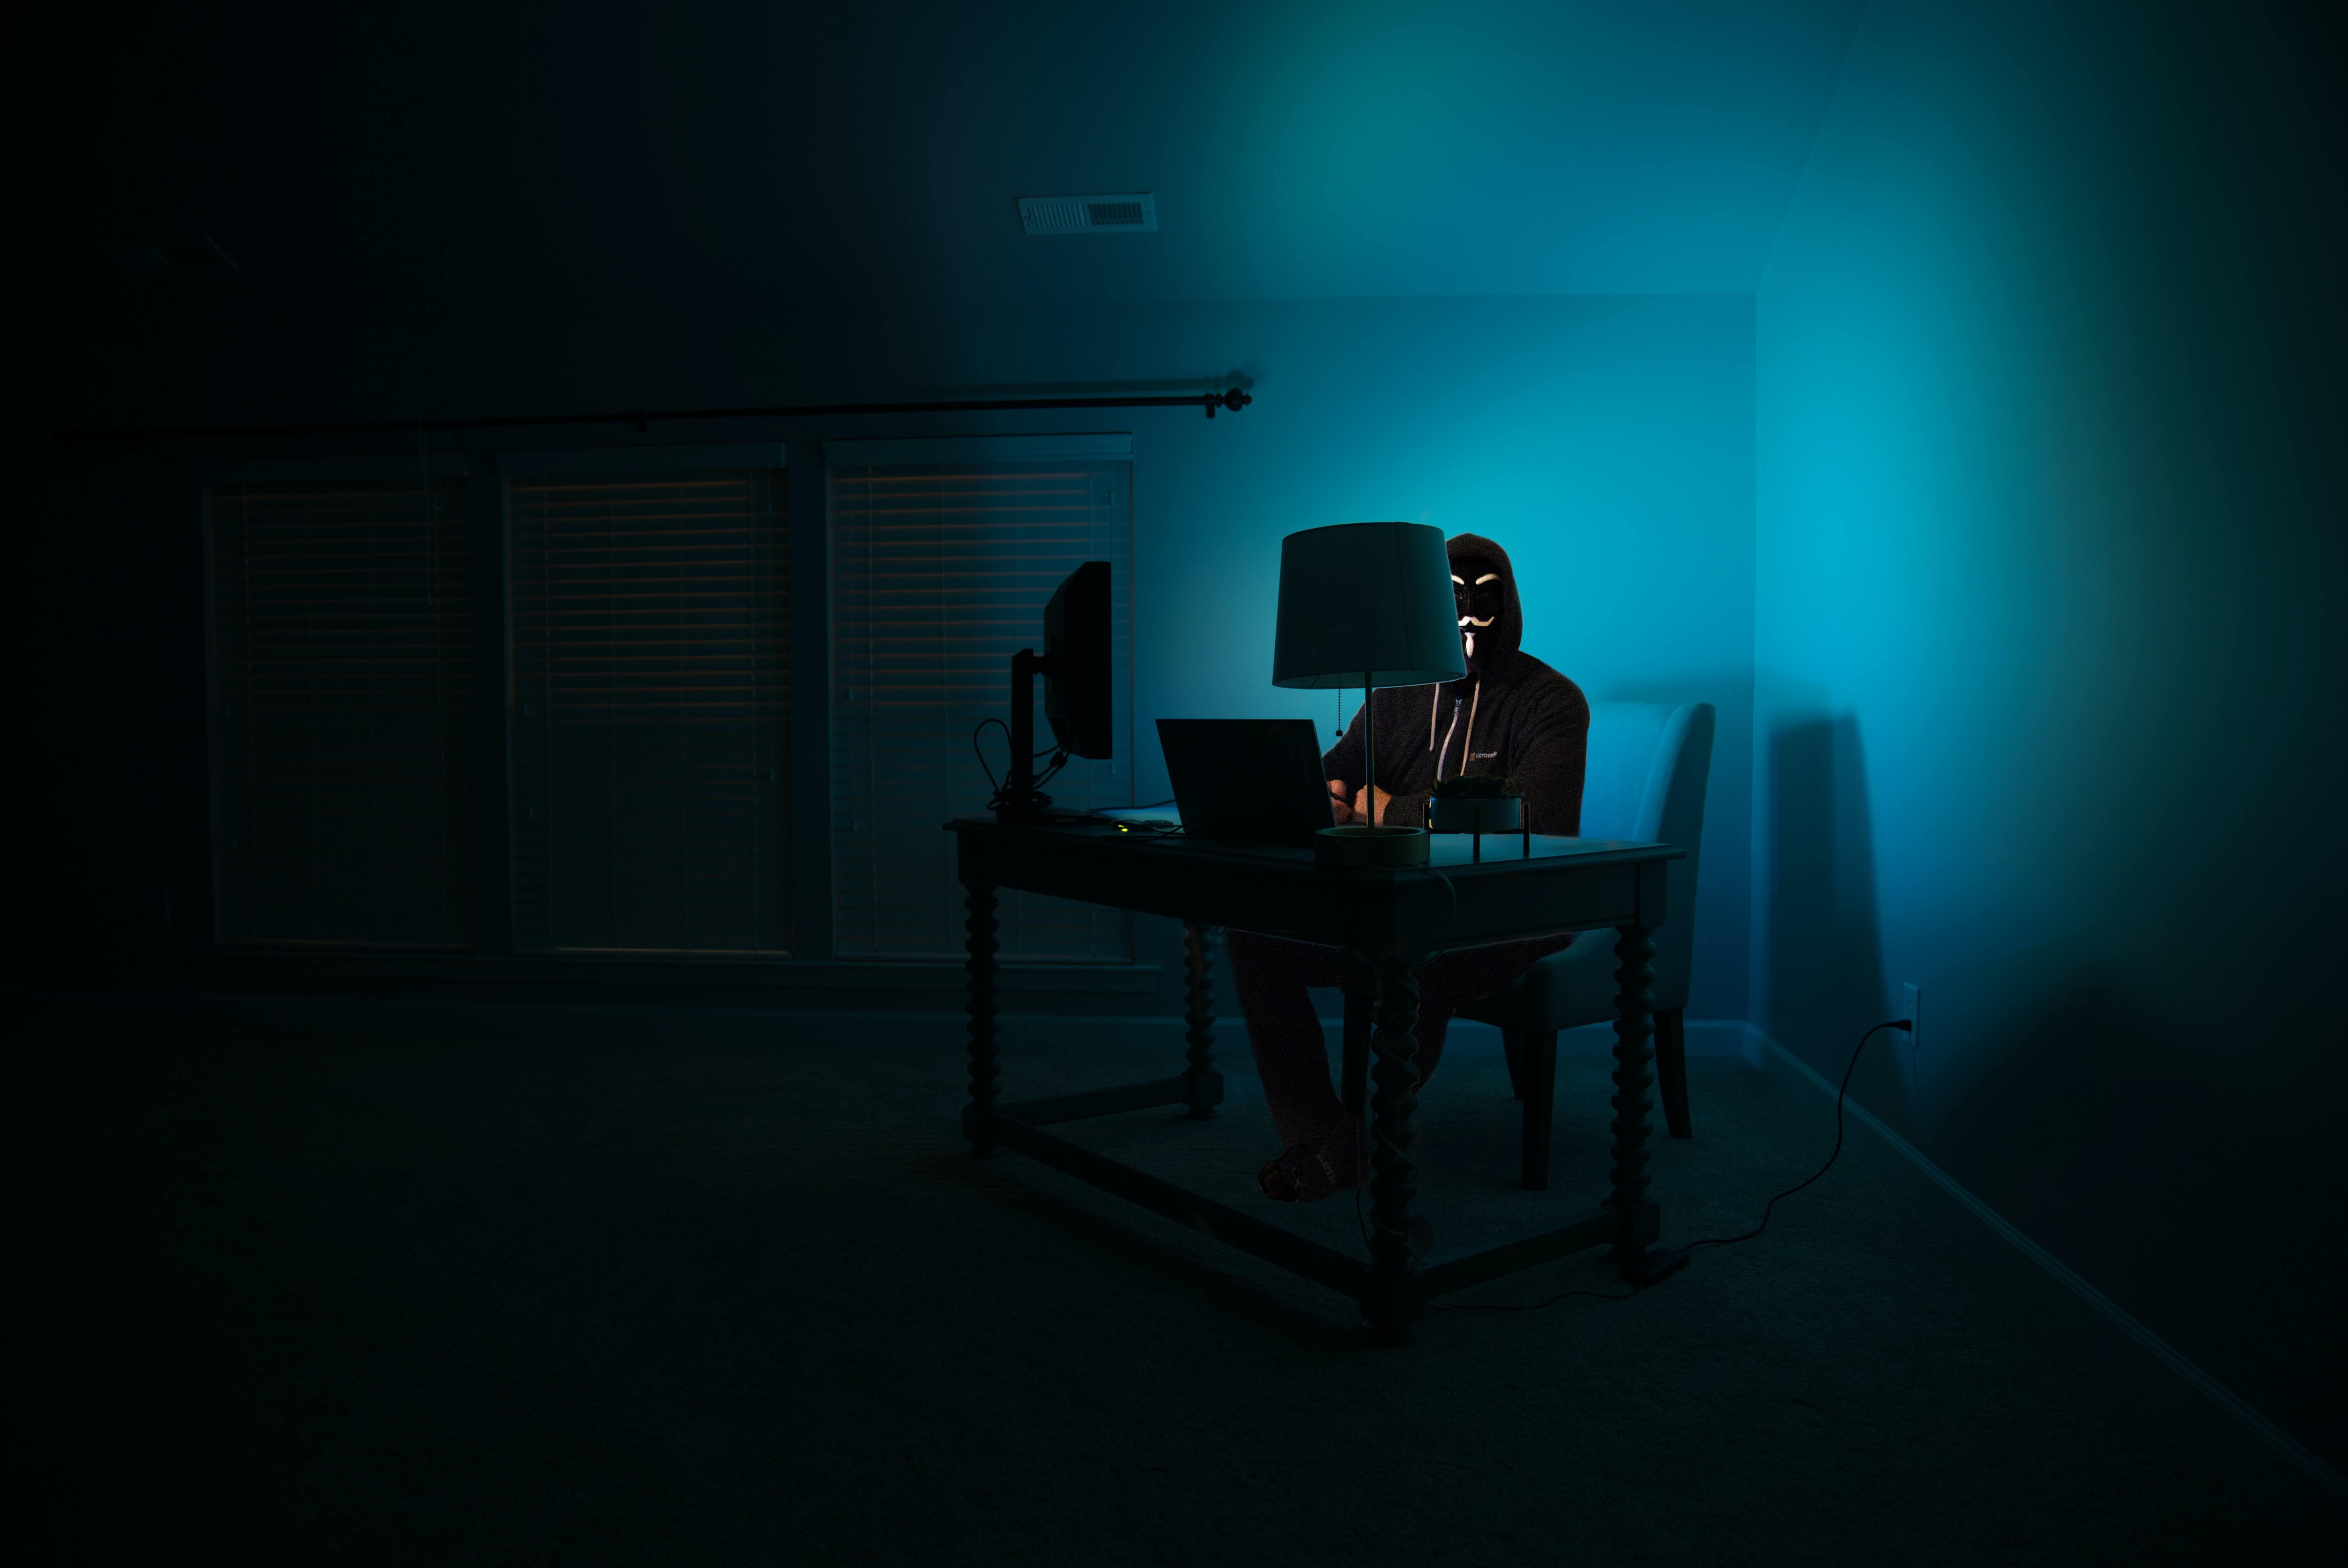 fraud cyber crime hk lawyer